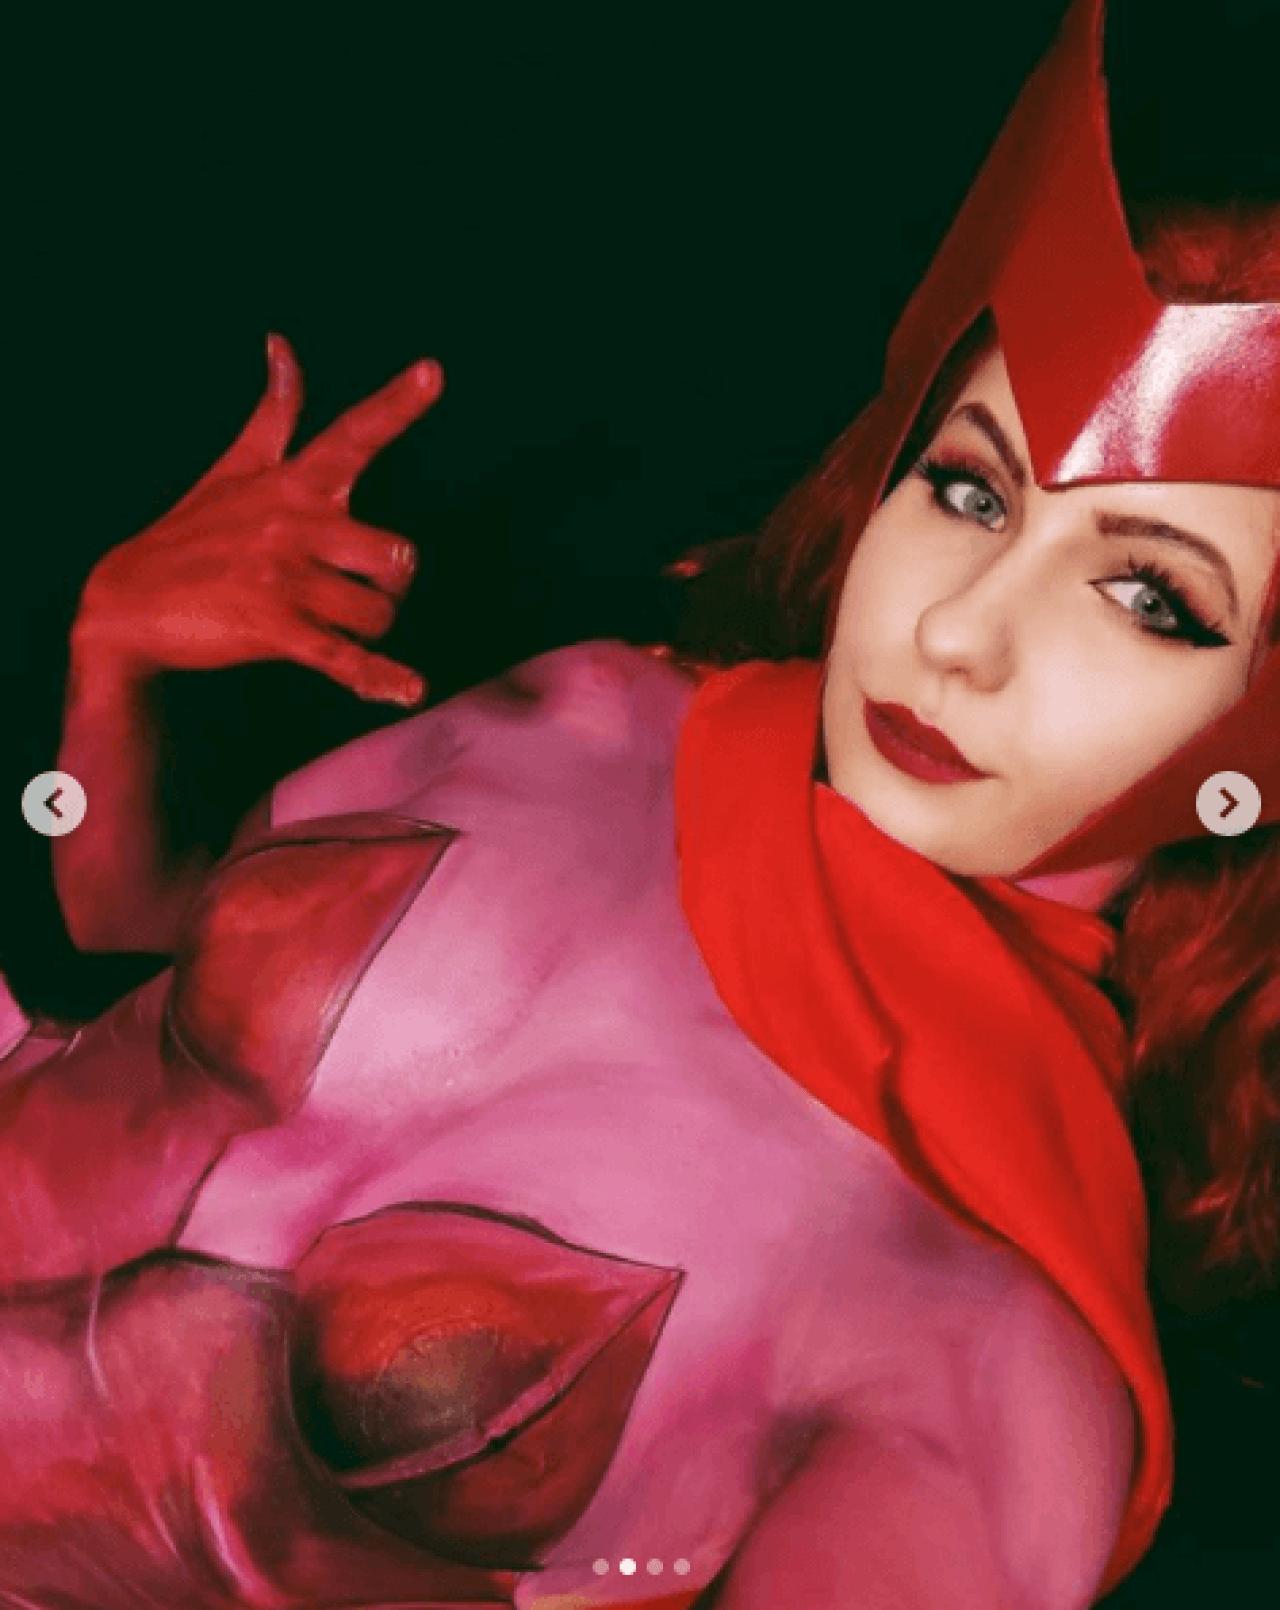 bruja escarlata cosplay